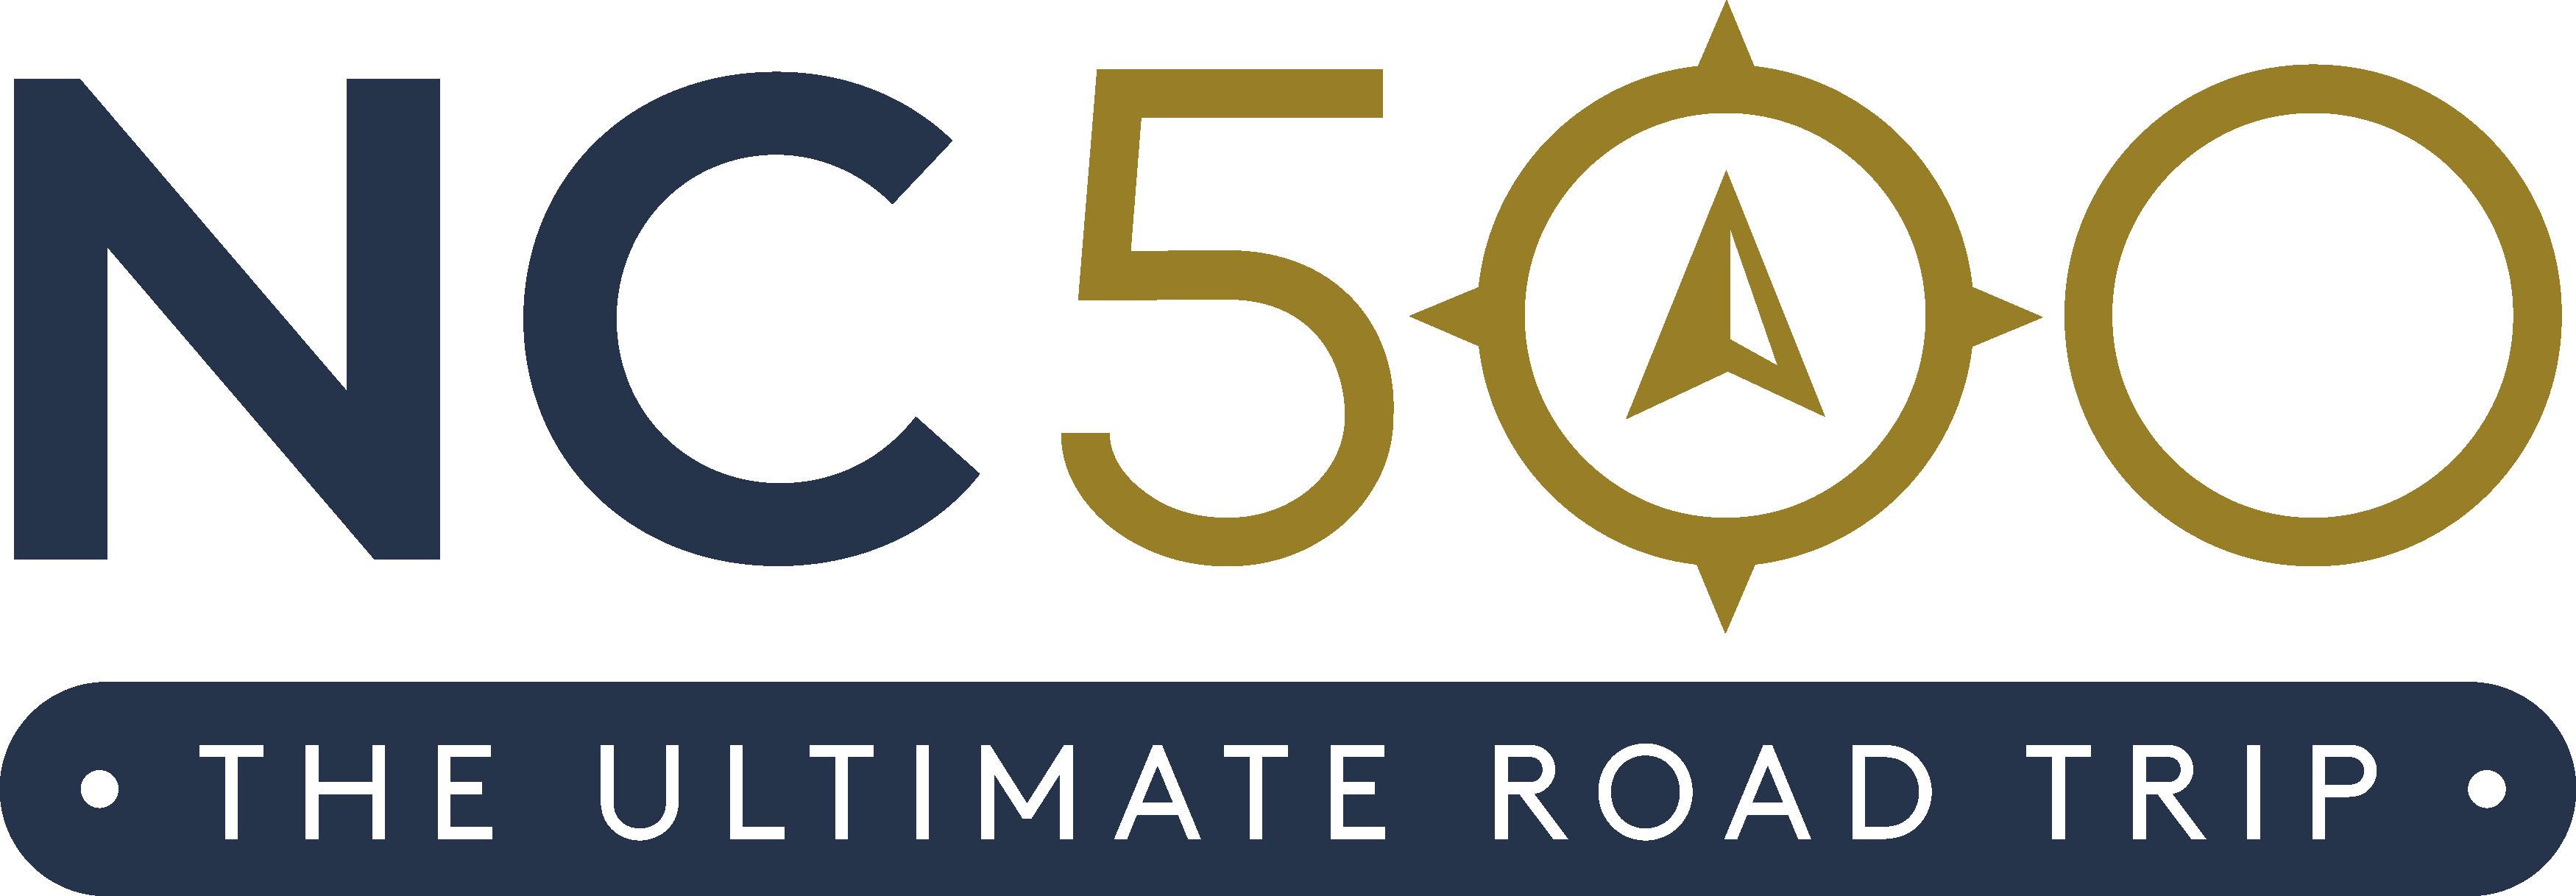 500 North Coast